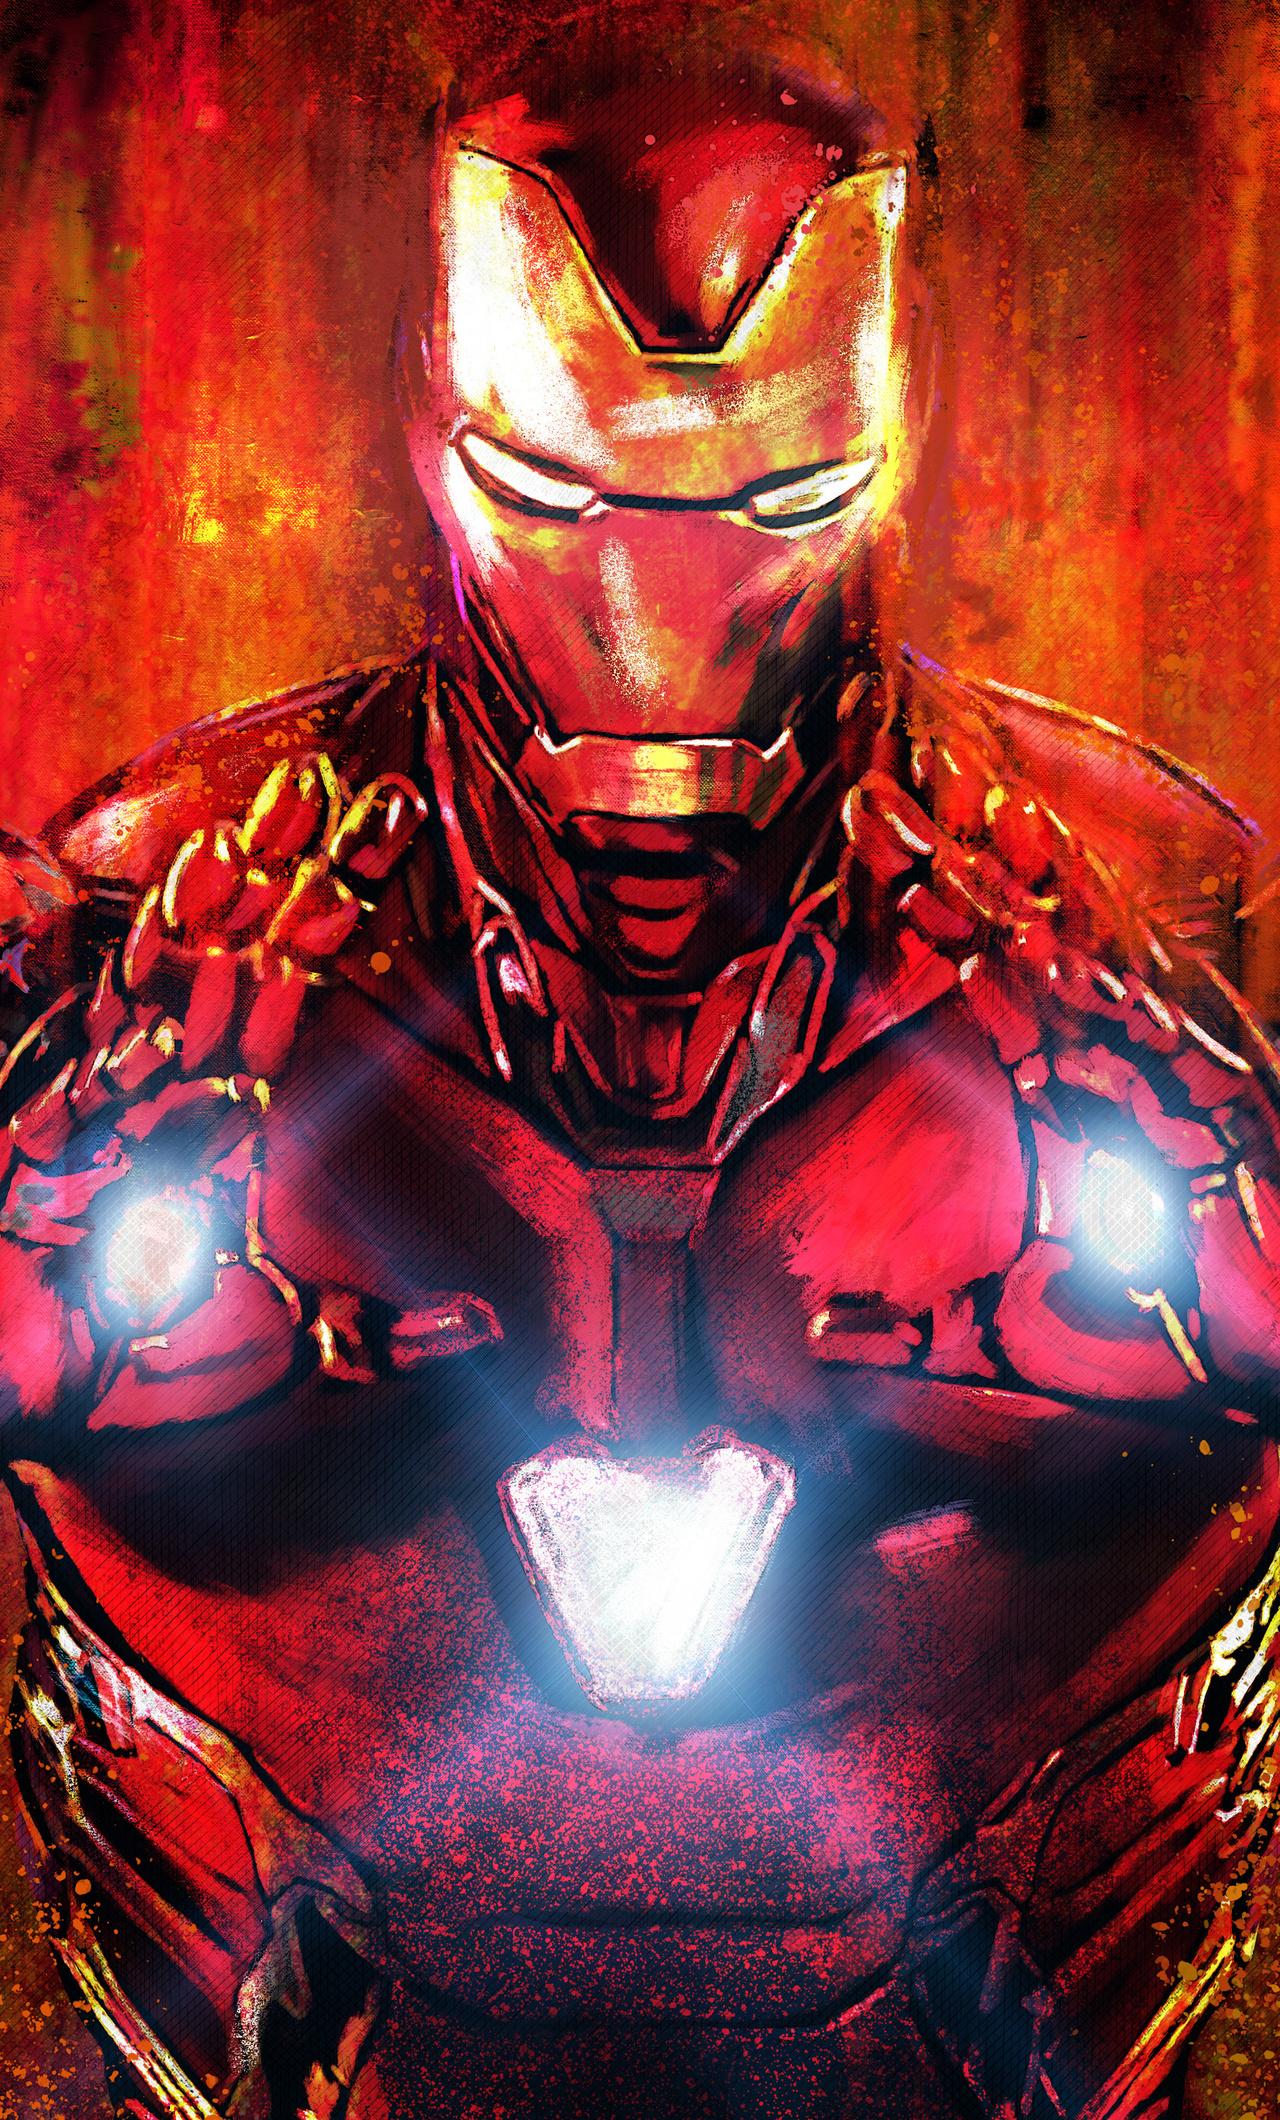 1280x2120 Iron Man Avengers Endgame 5k 2019 iPhone 6+ HD ...